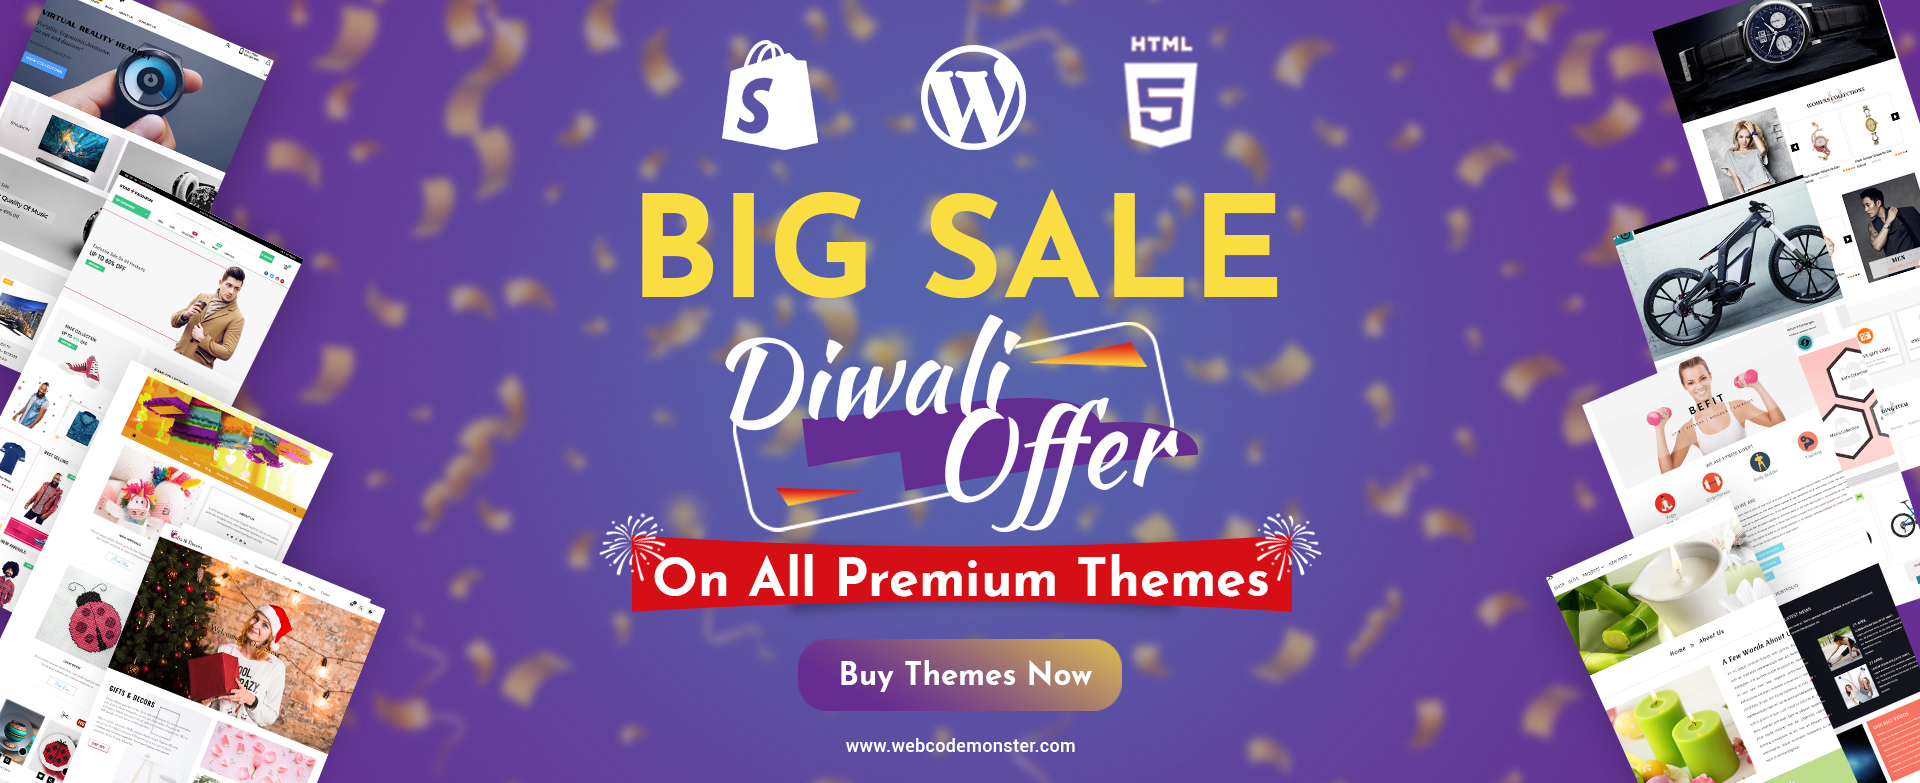 Big Sale Diwali Offers